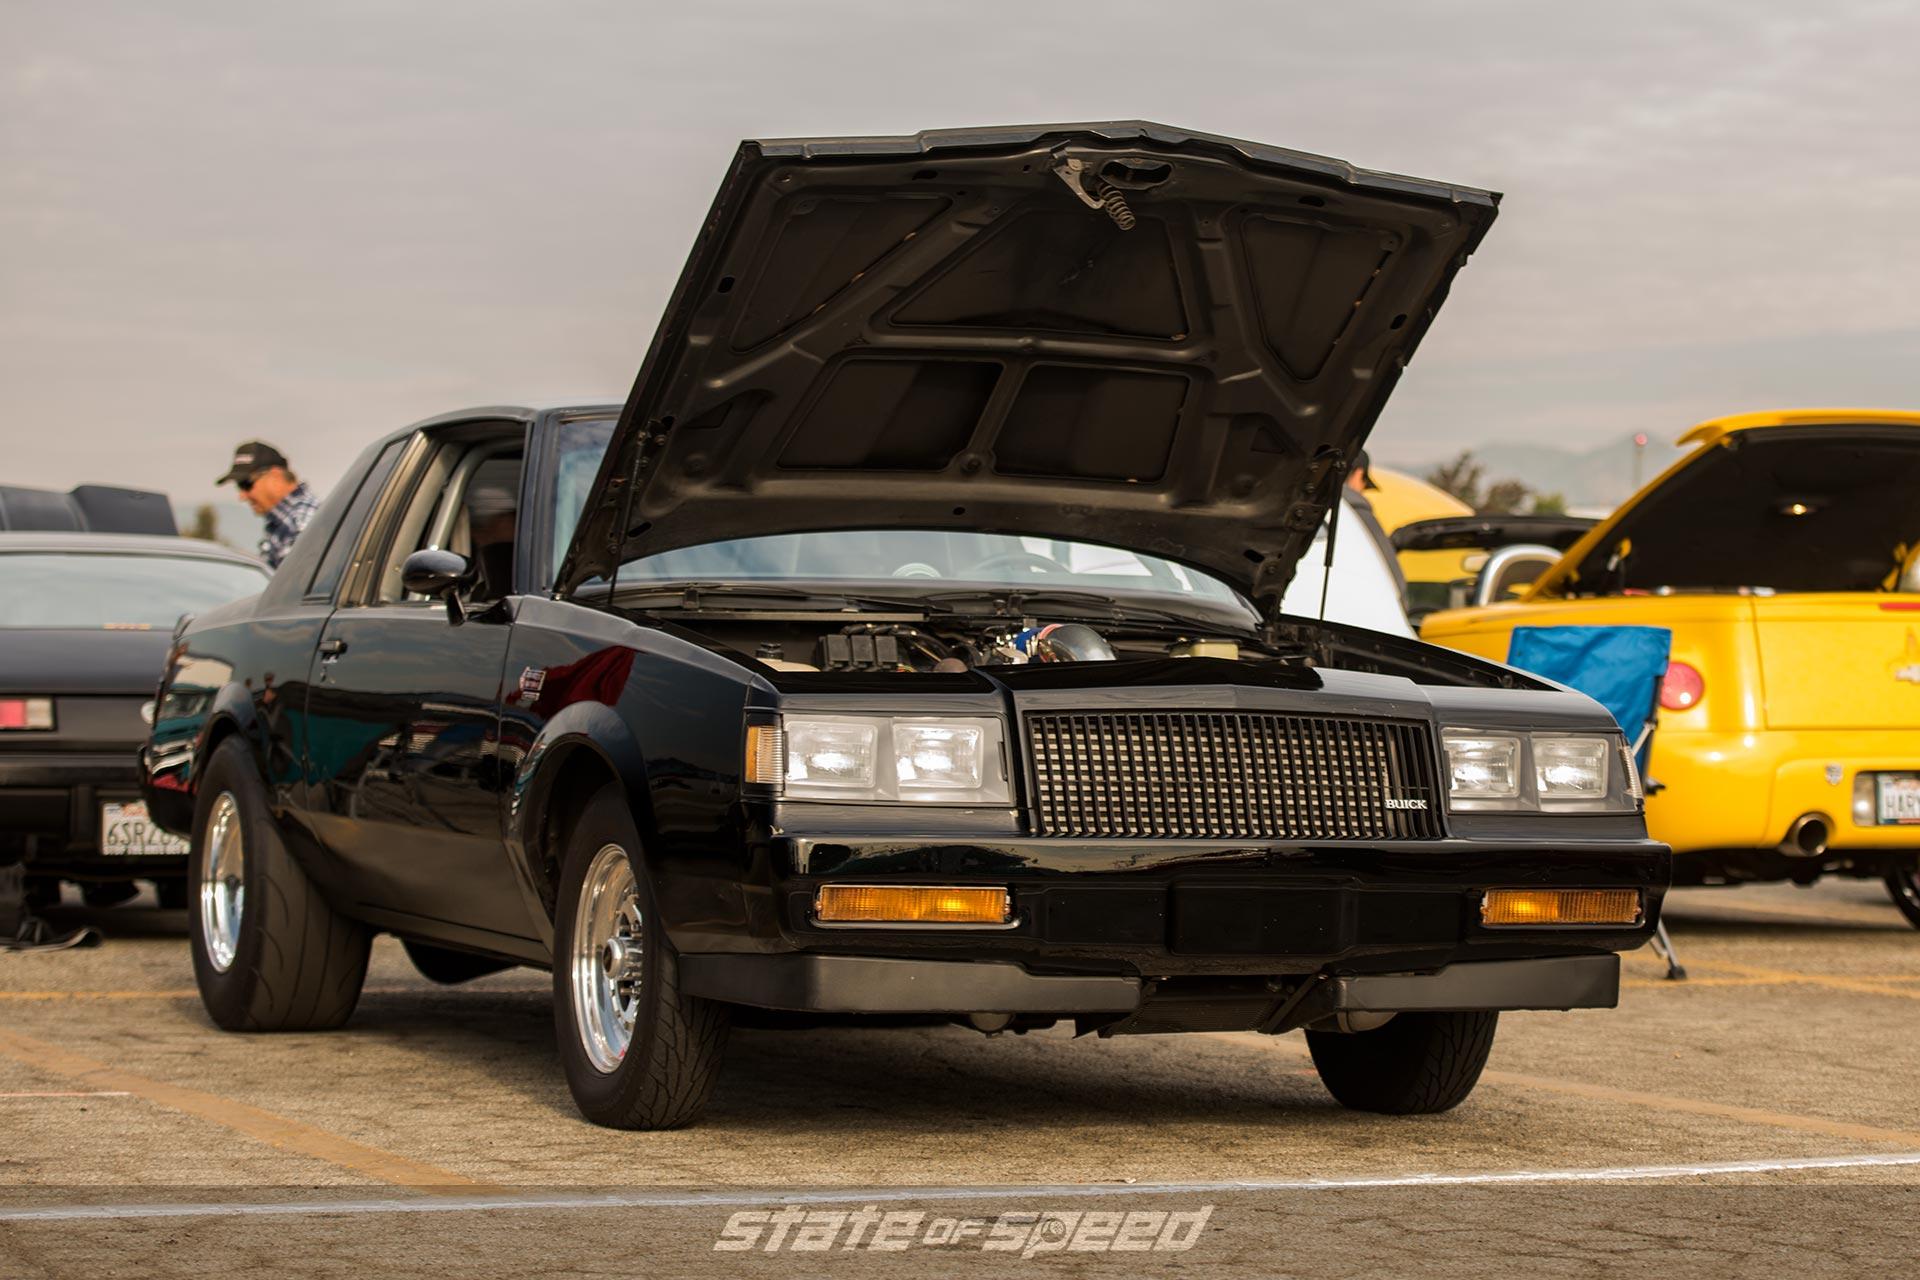 Buick Grand National, turbocharged